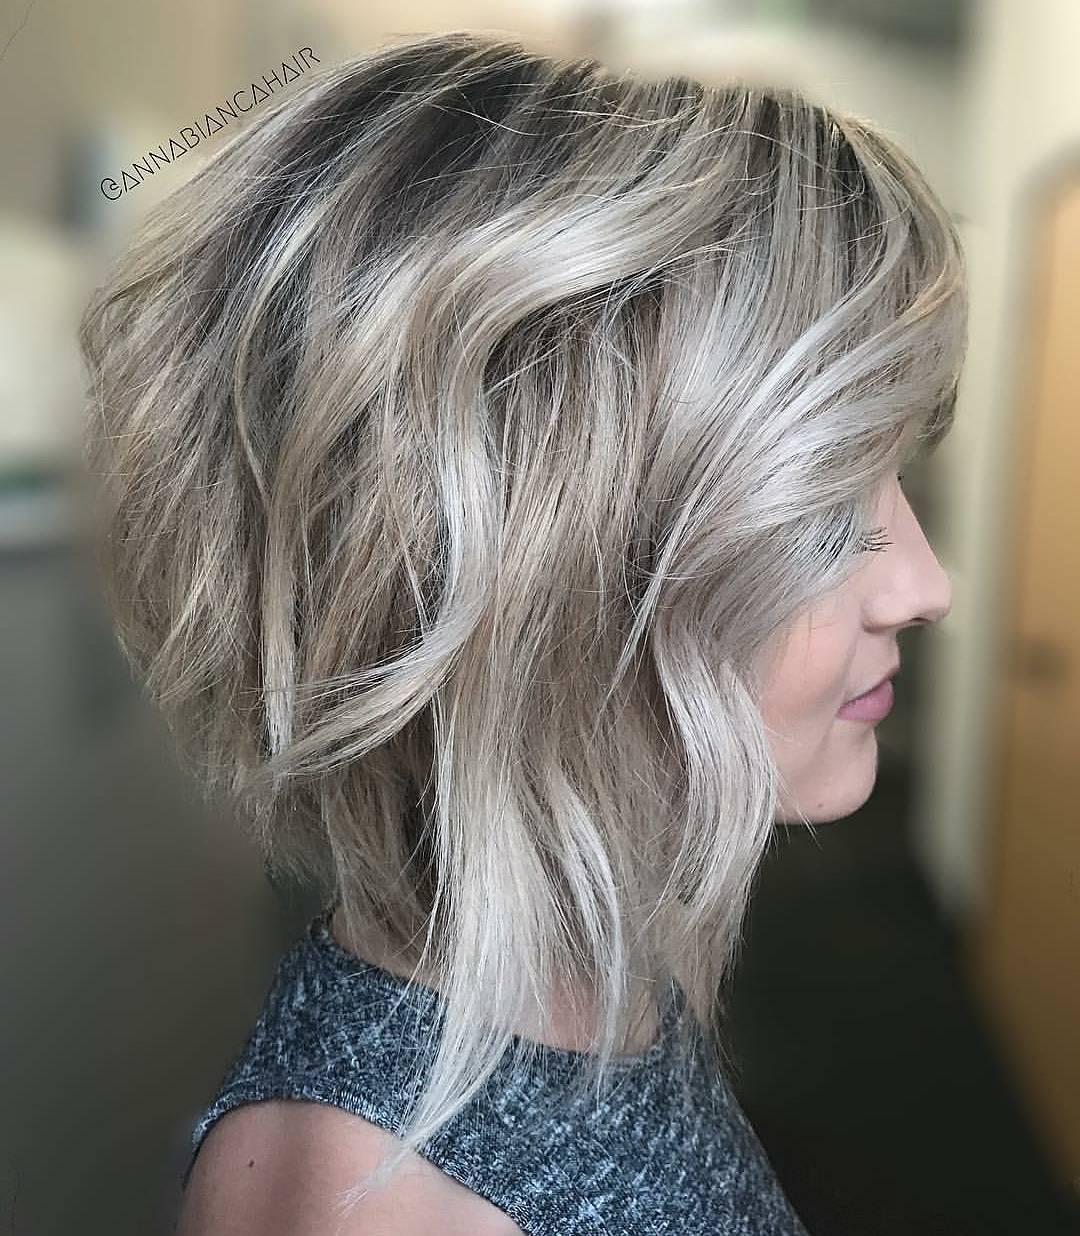 10 stylish medium bob haircuts for women - easy-care chic